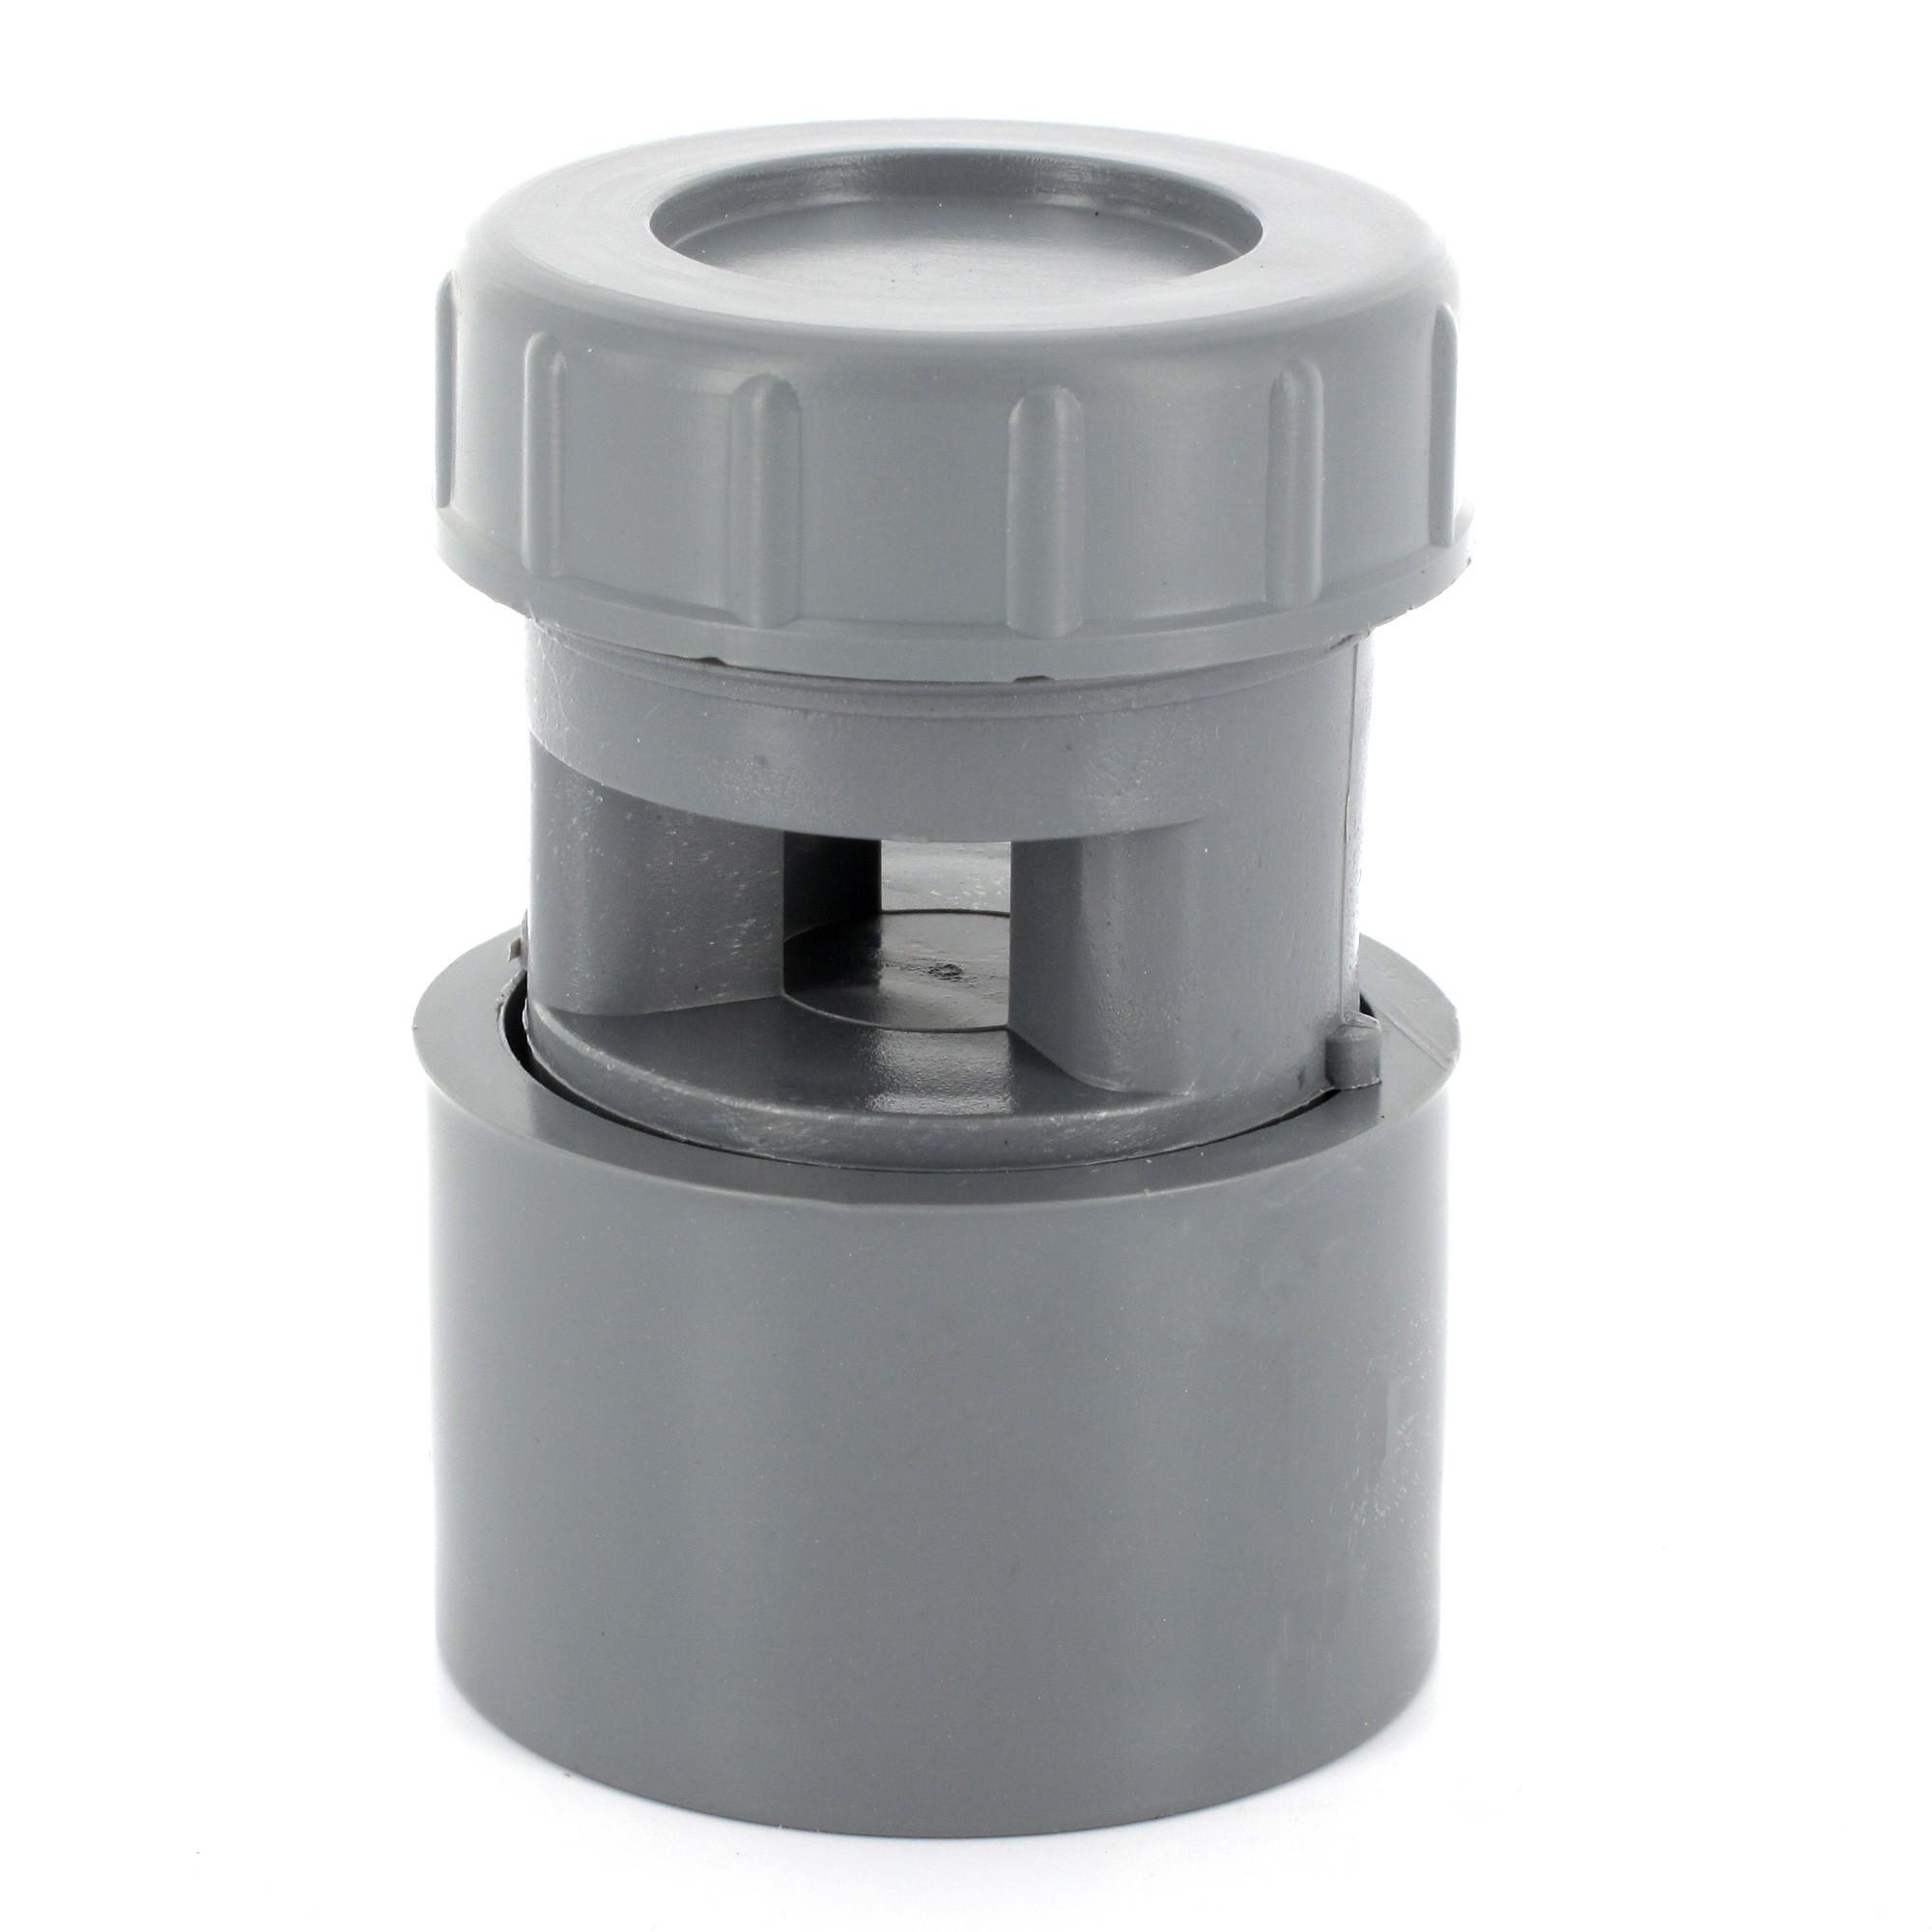 A rateur membrane pvc diam tre 32 40 ou 50 - Clapet anti odeur pvc ...